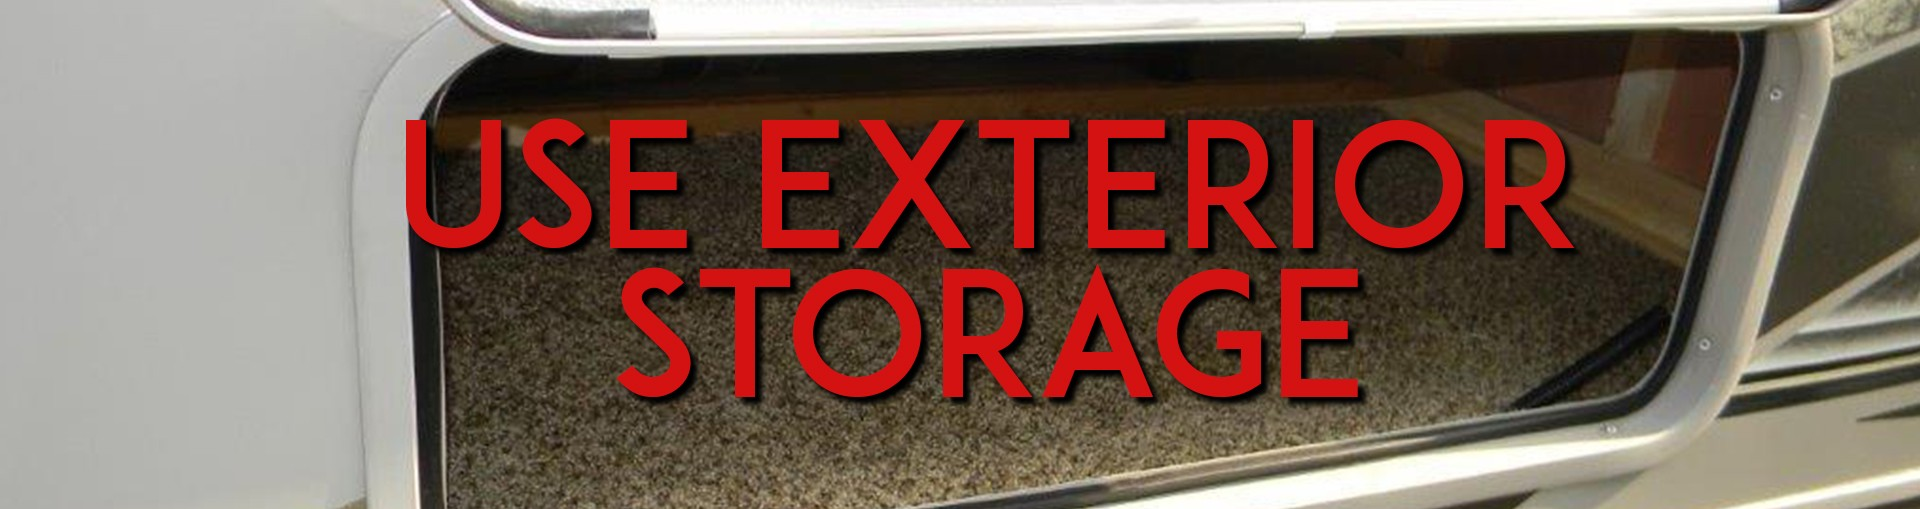 use exterior storage